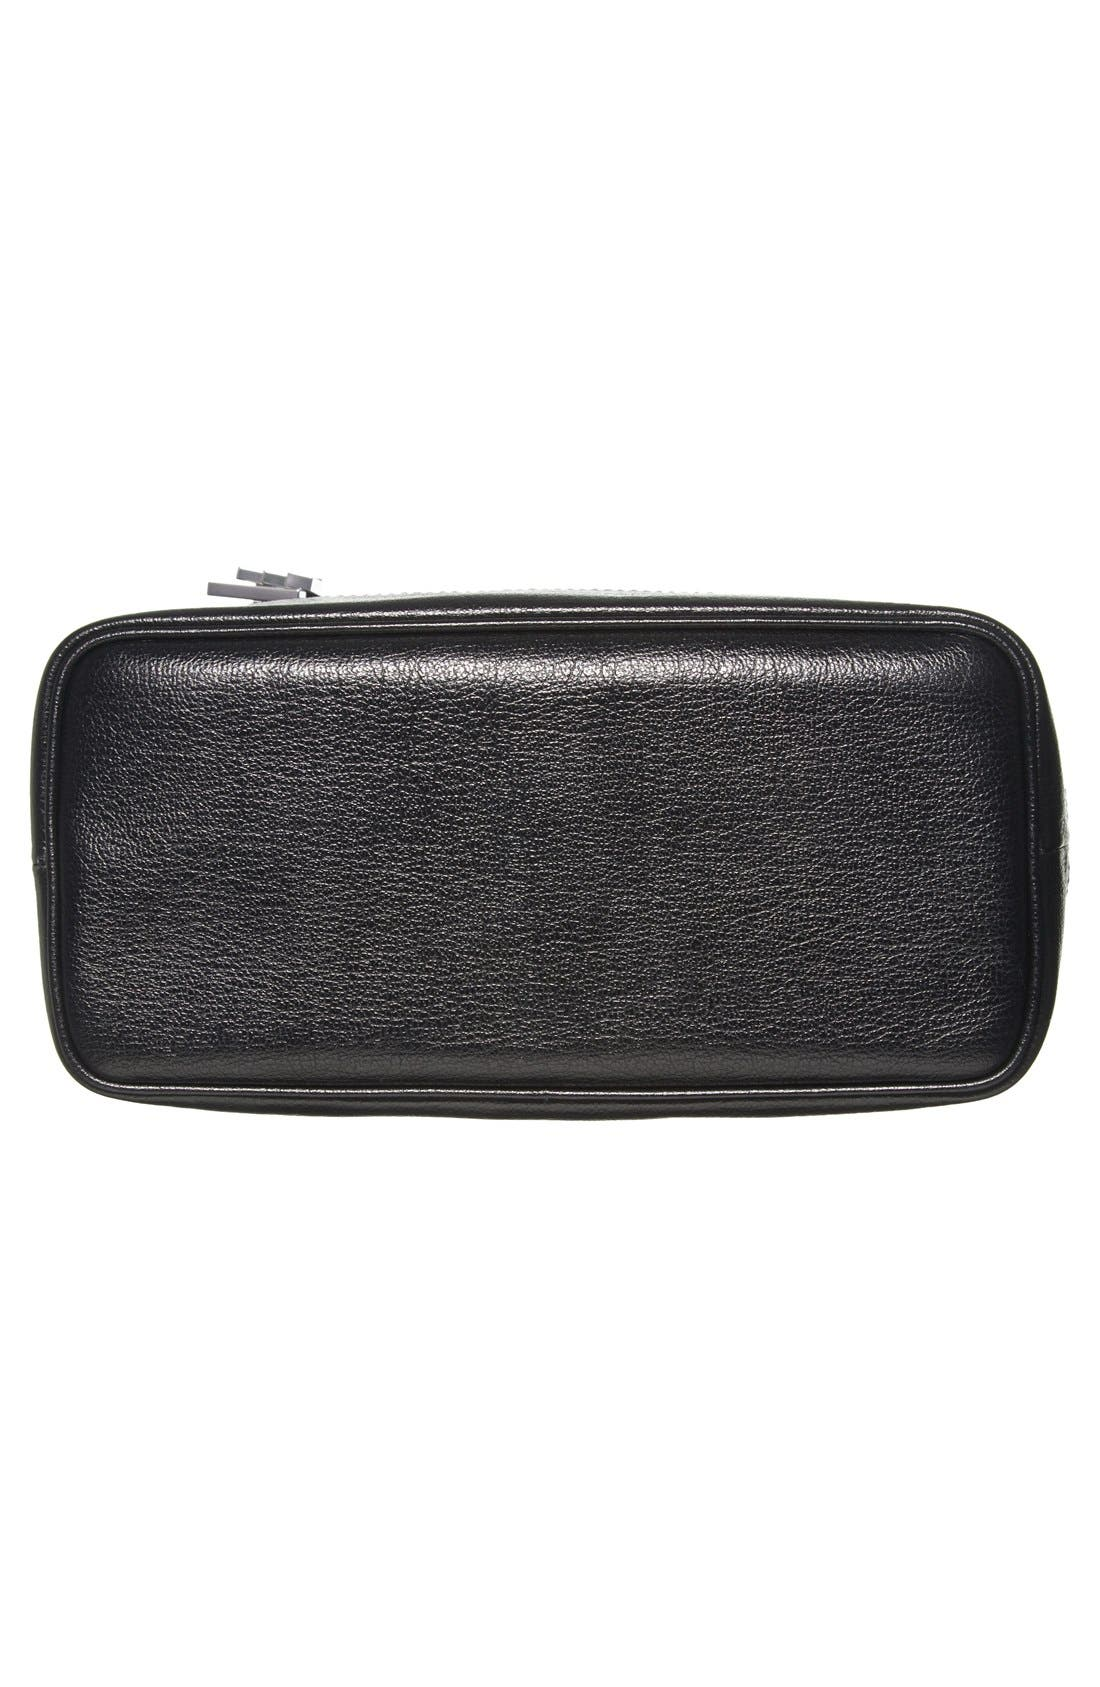 Leather Bucket Crossbody Bag,                             Alternate thumbnail 6, color,                             Black/ Palladium